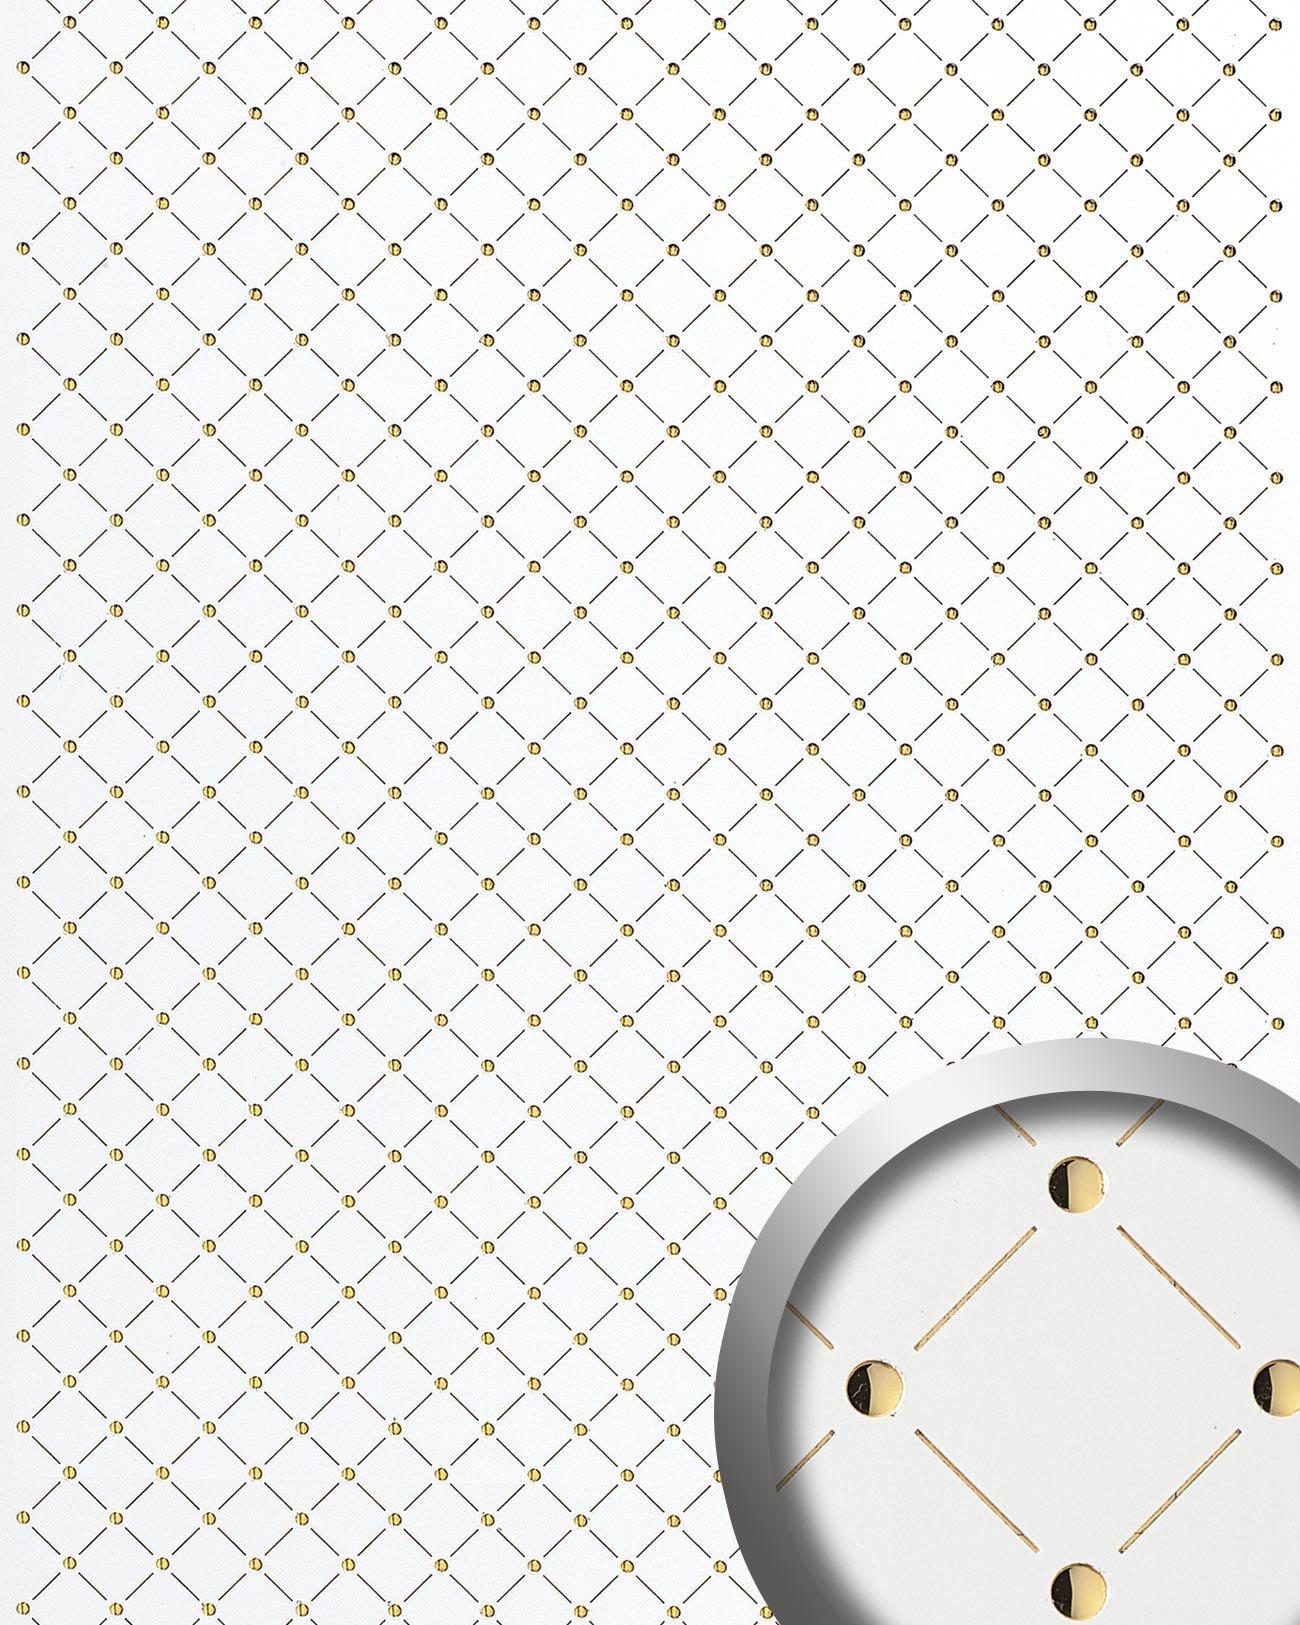 WallFace 17856 3D Wall panel self-adhesive Mosaic decor Luxury wallcovering self-adhesive pearlwhite gold | 2,60 sqm by Wallface (Image #1)